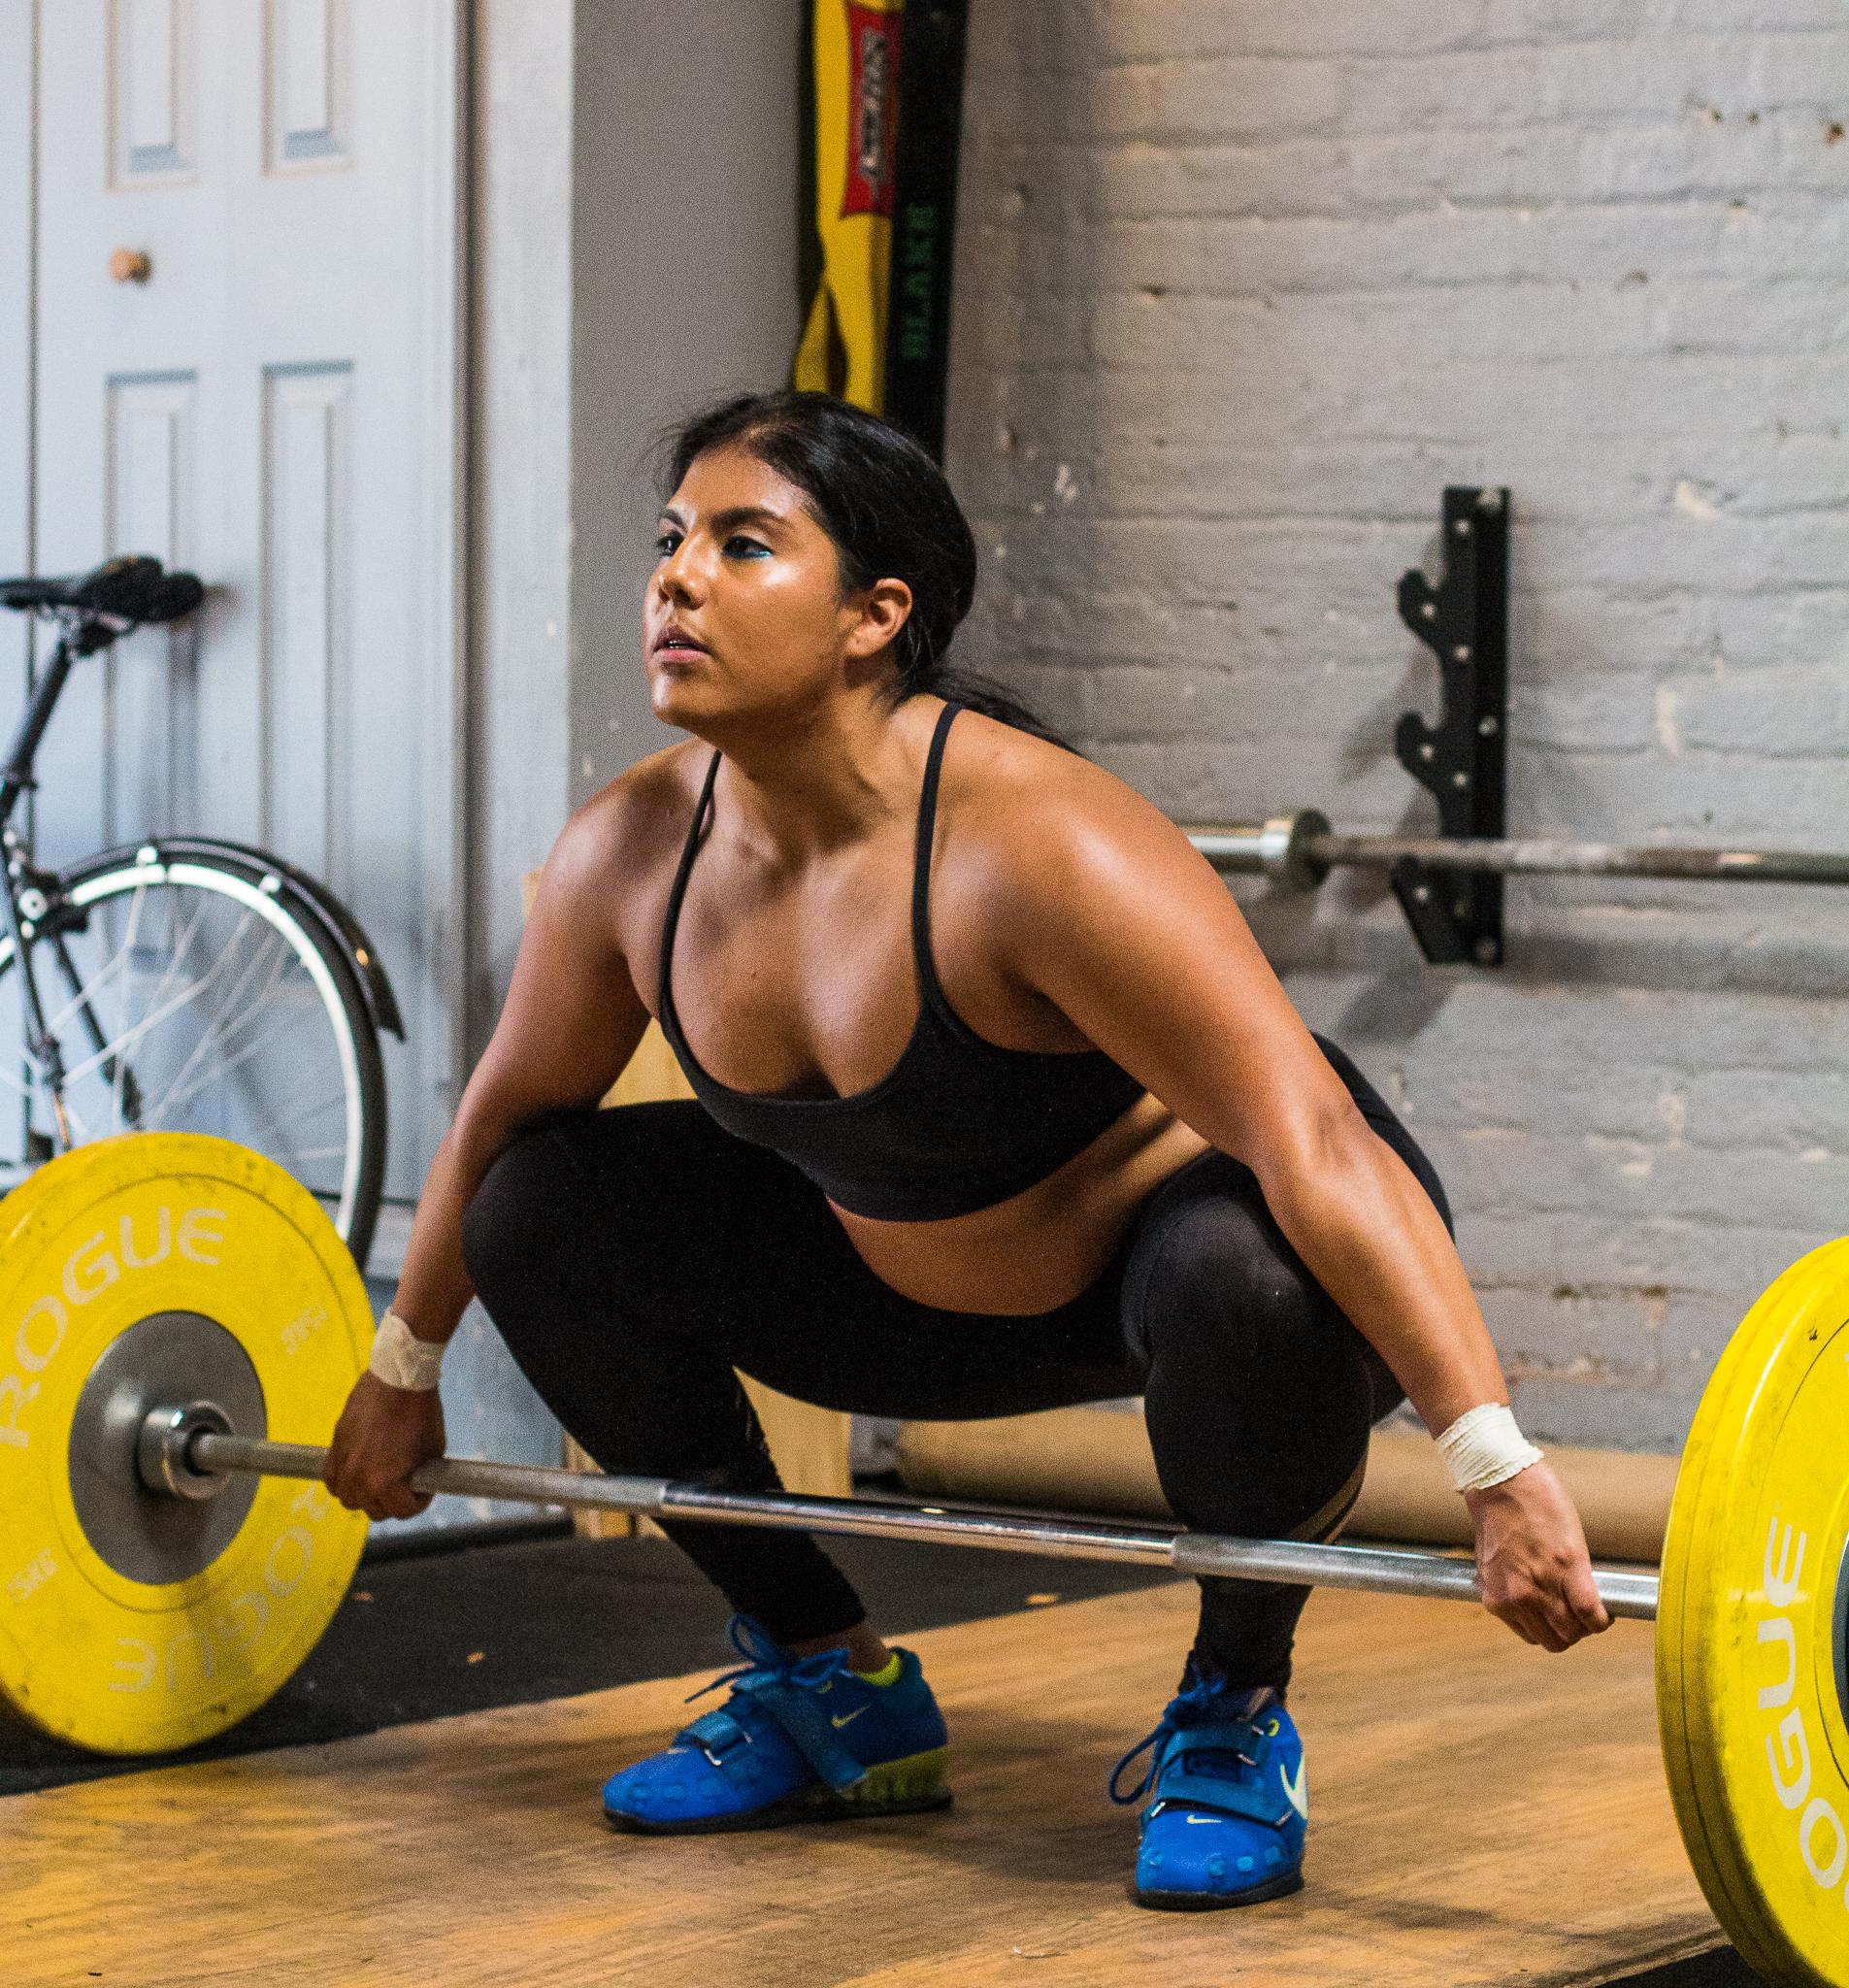 james-wright-visit-brooklyn-new-york-weightlifting-coach-teammates-october-2016 (12 of 92).jpg